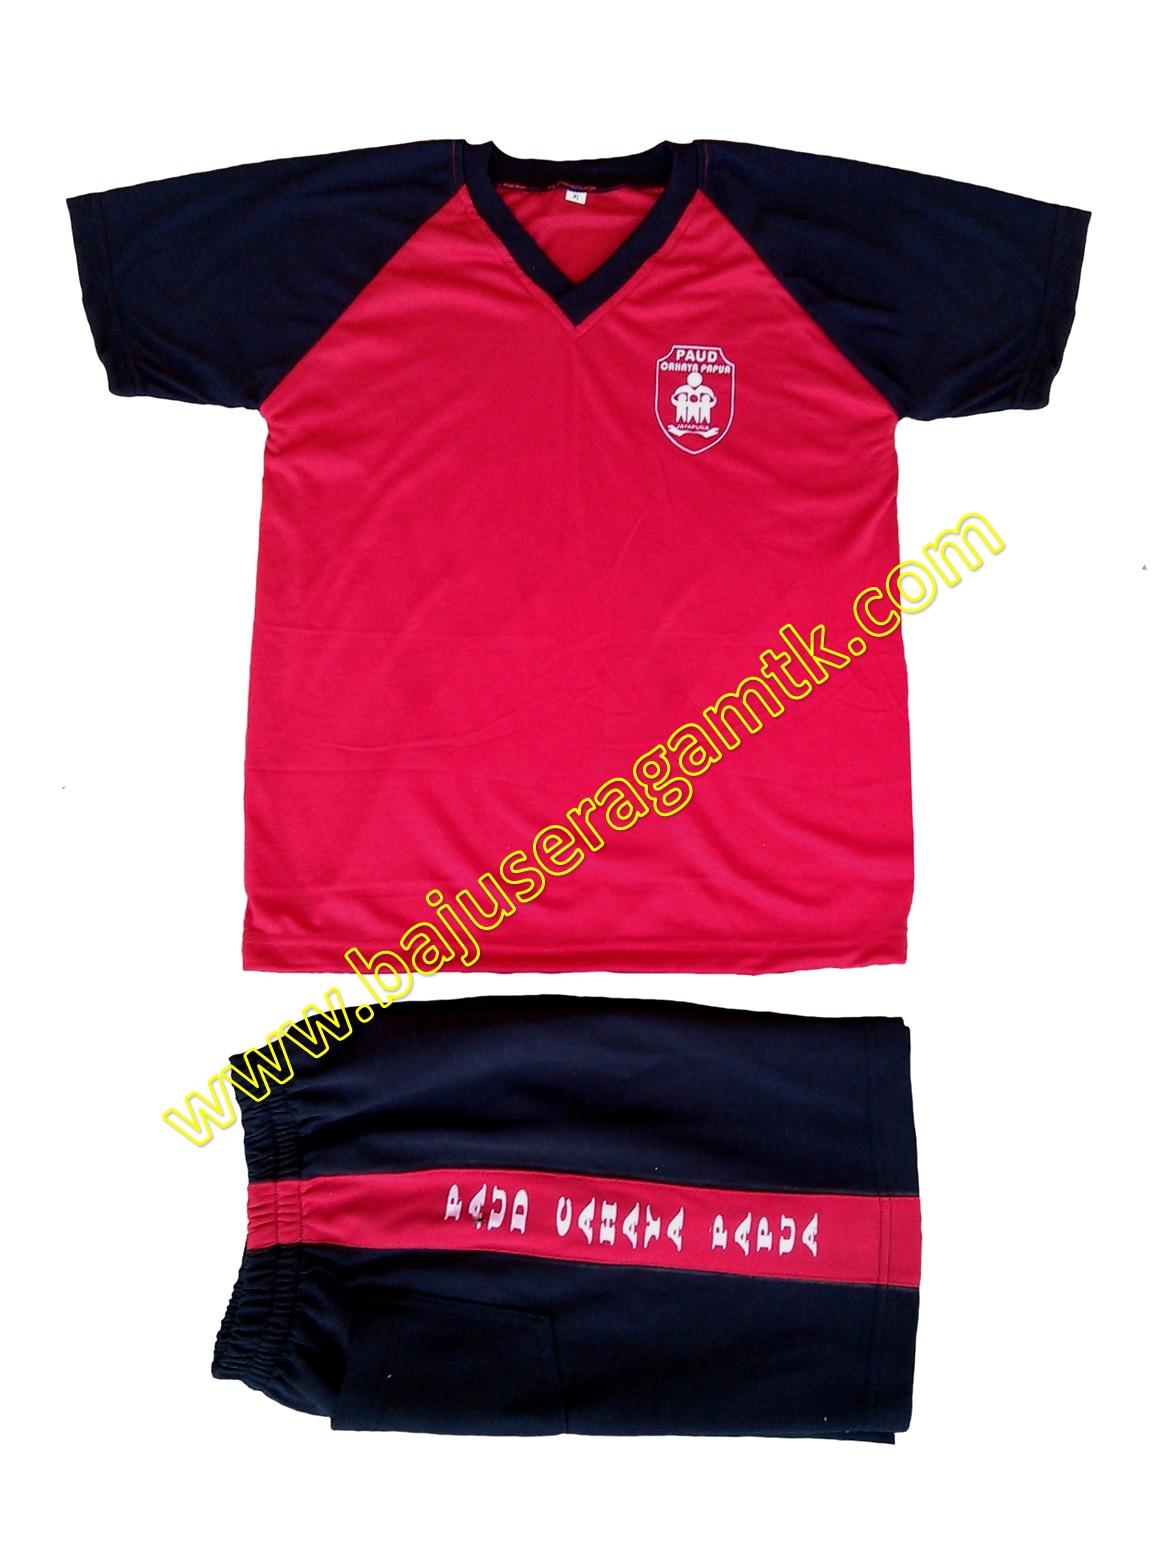 jual baju seragam TK PAUD model kaos olahraga anak tk